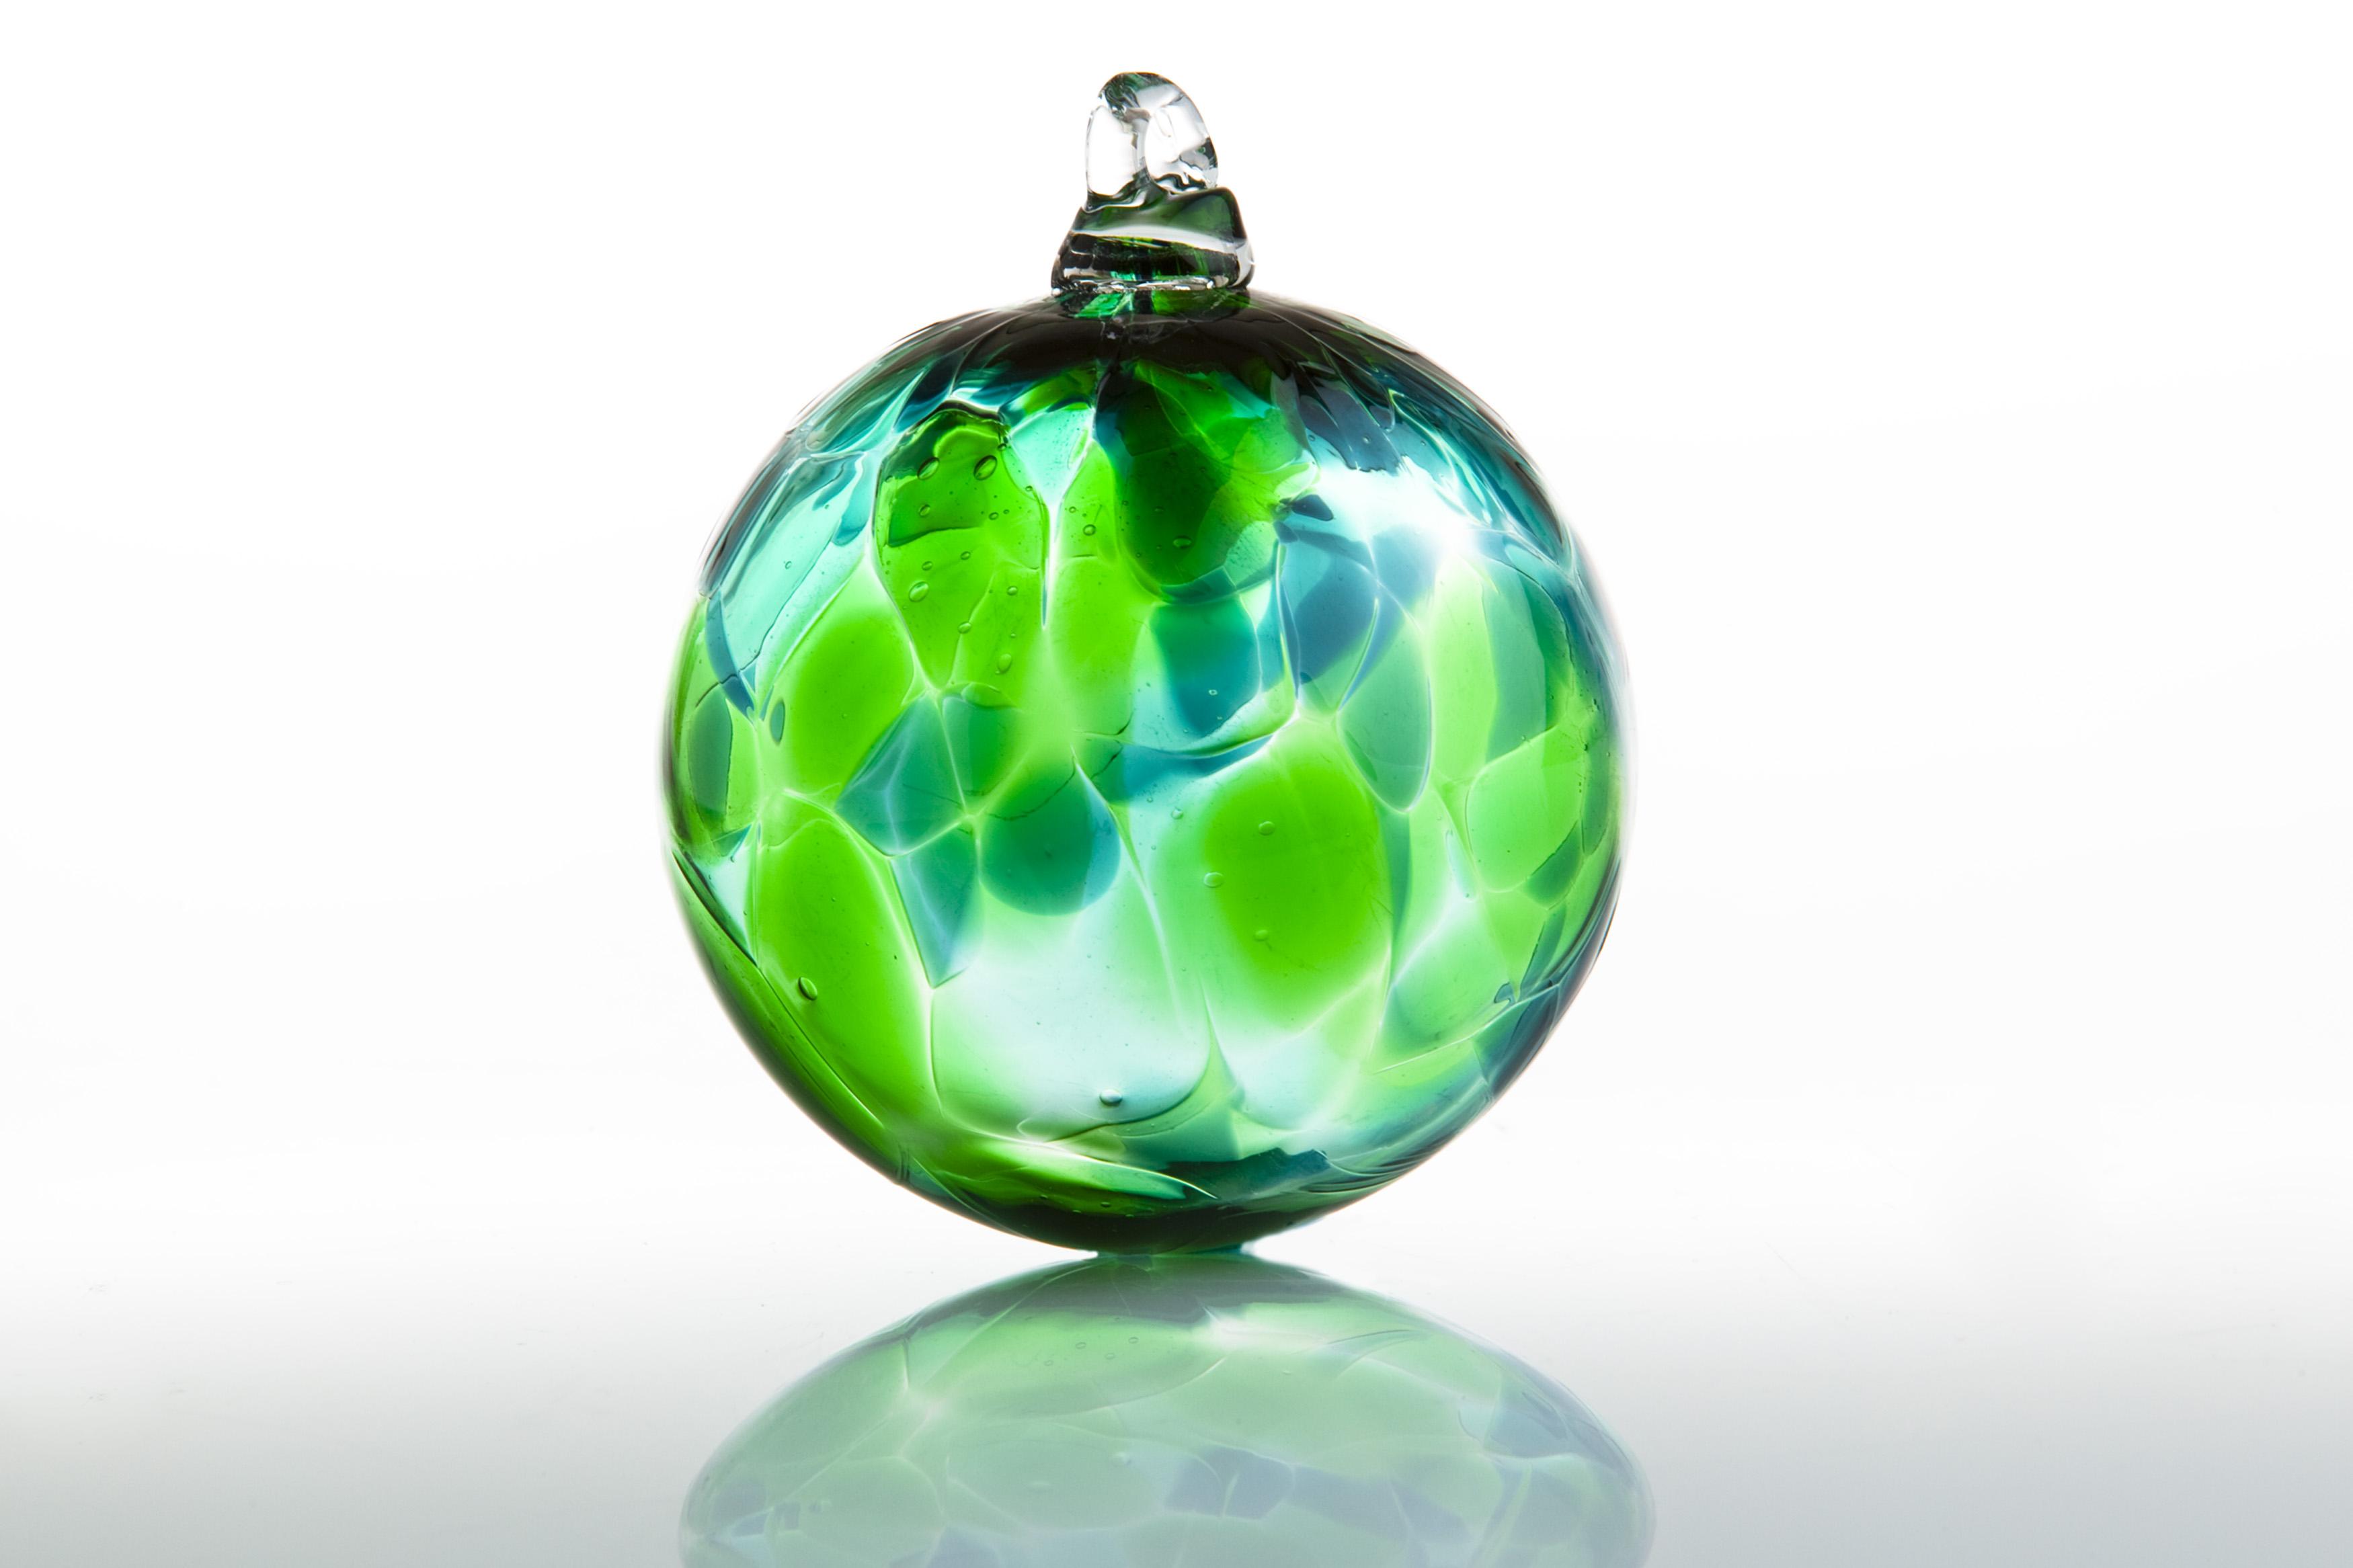 2010 Ornaments00007.jpg